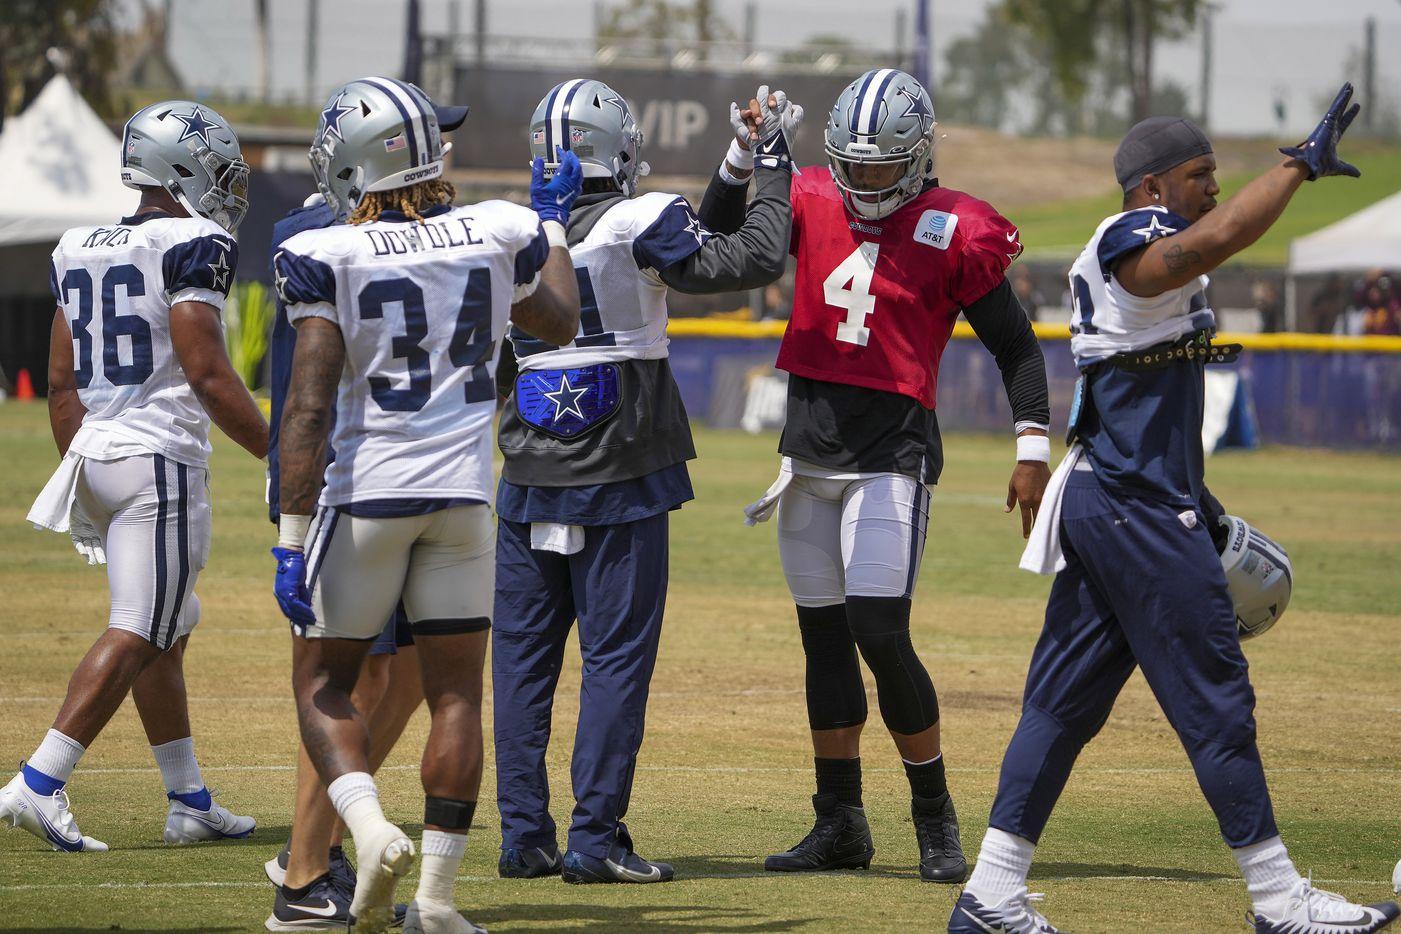 Dallas Cowboys quarterback Dak Prescott (4) does a dance with running back Ezekiel Elliott (21) during a practice at training camp on Wednesday, Aug. 11, 2021, in Oxnard, Calif.